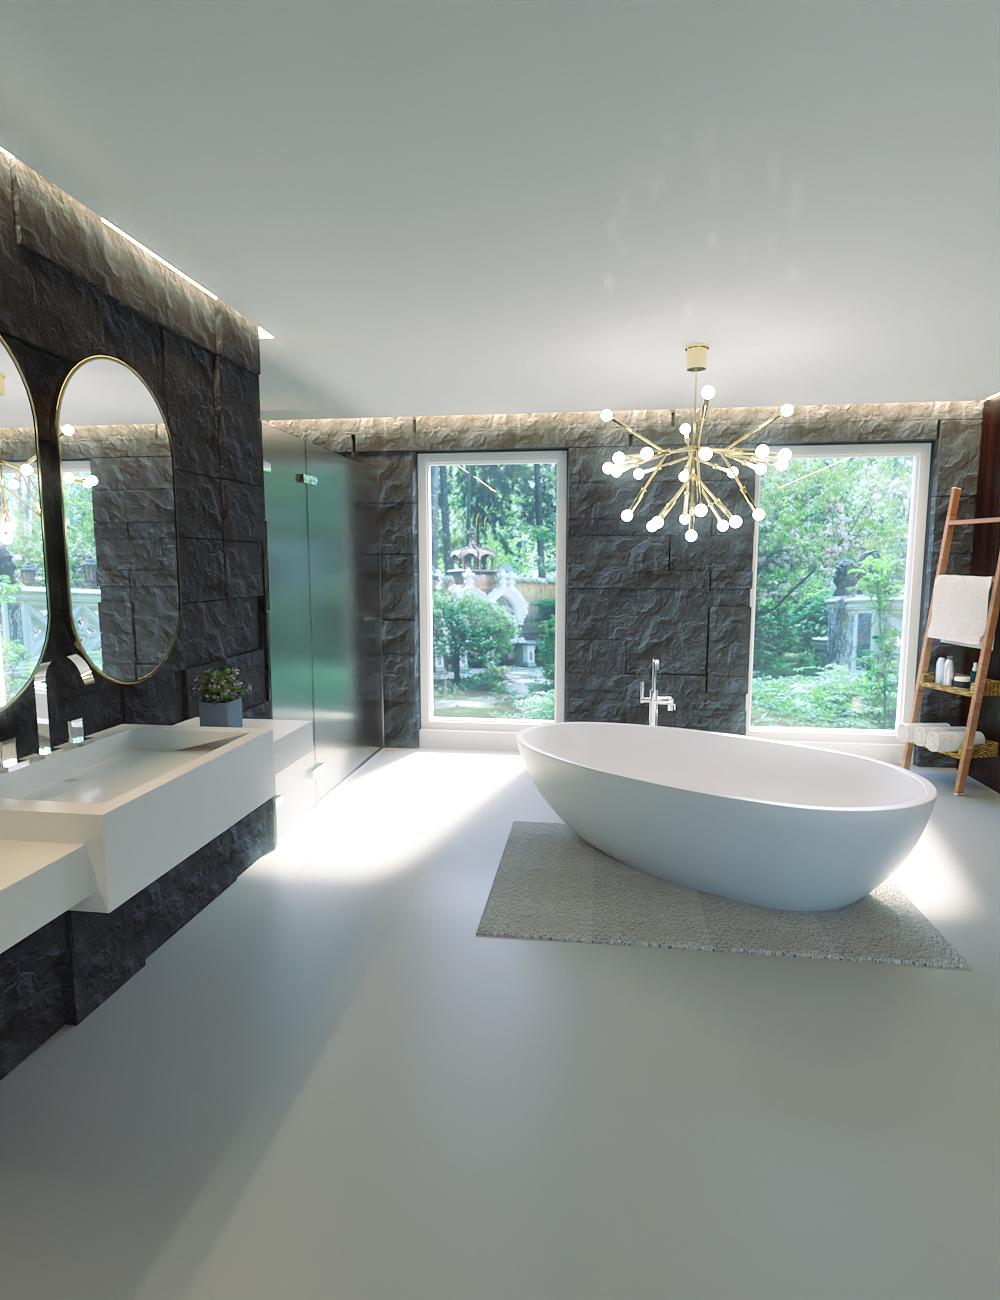 Modern Euro Bathroom by: kubramatic, 3D Models by Daz 3D